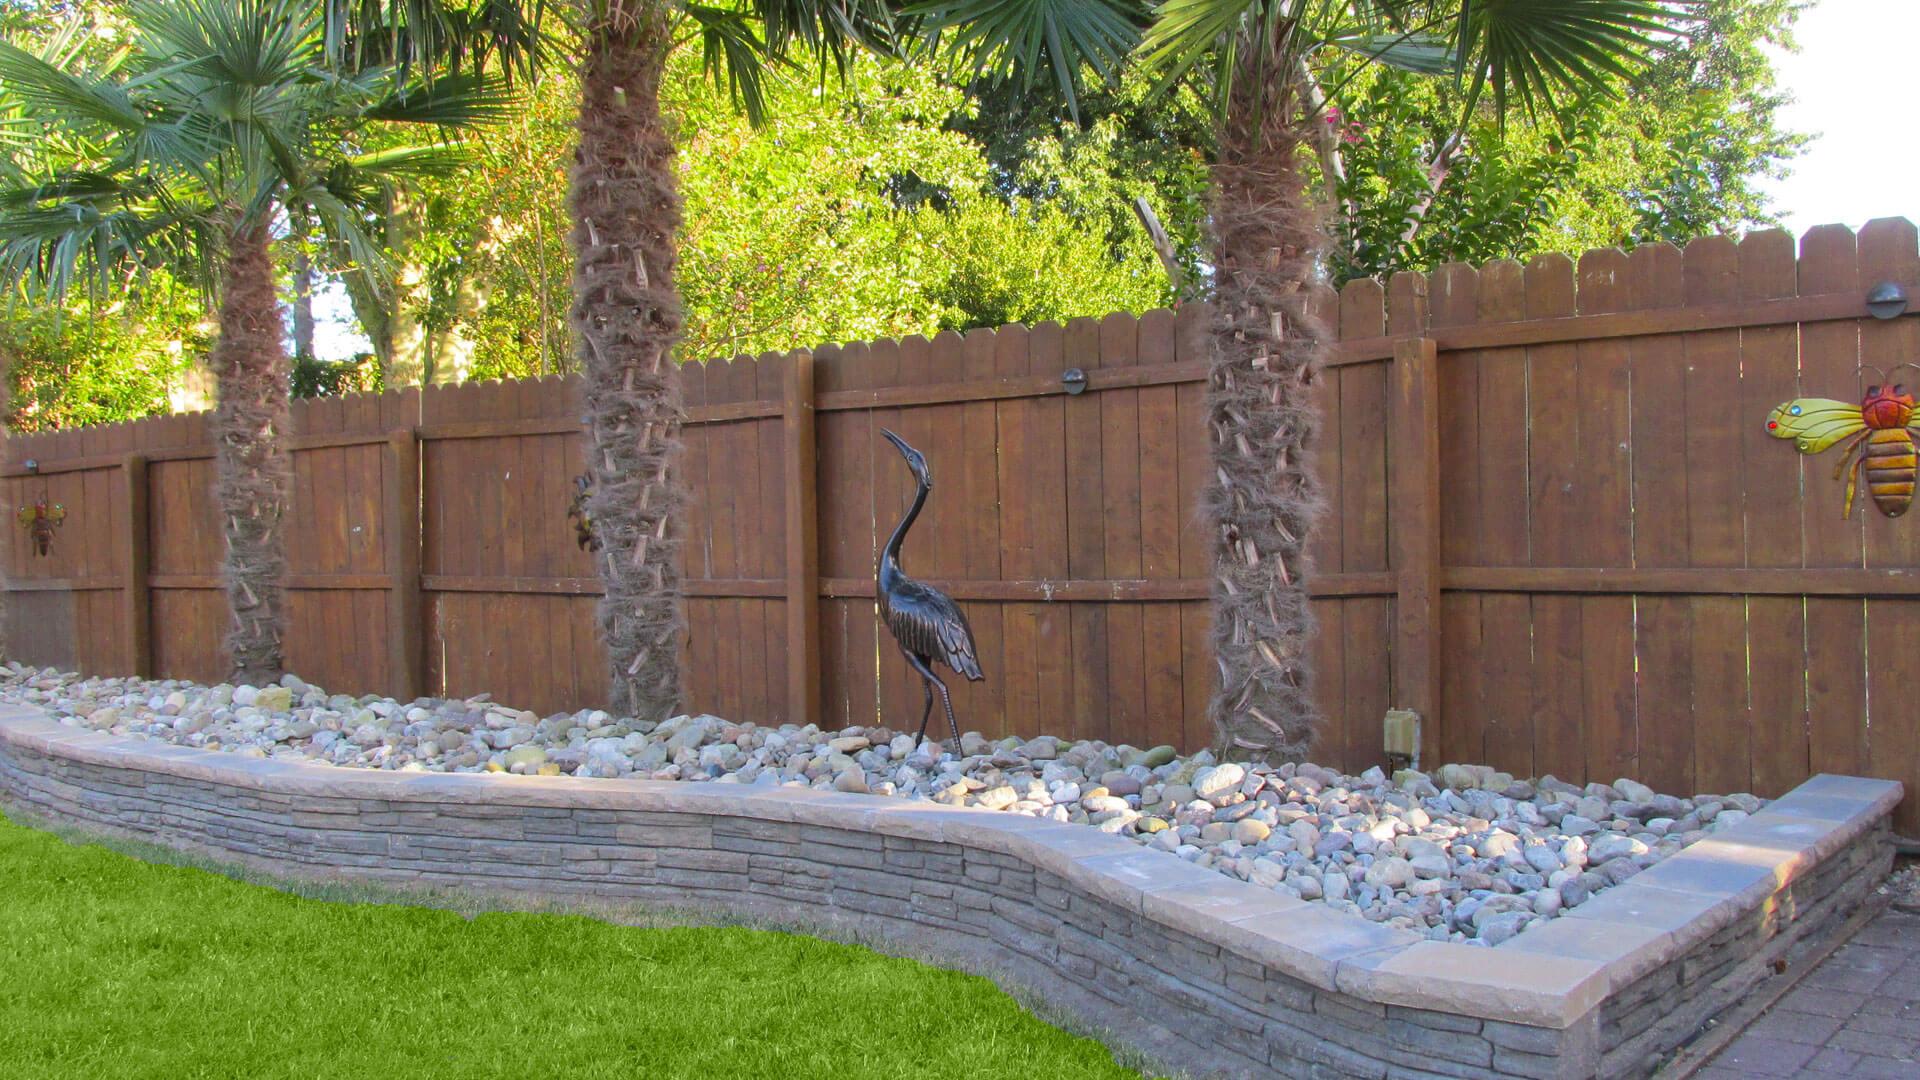 Santa Clara Landscaping Company, Concrete Contractor and Landscaper